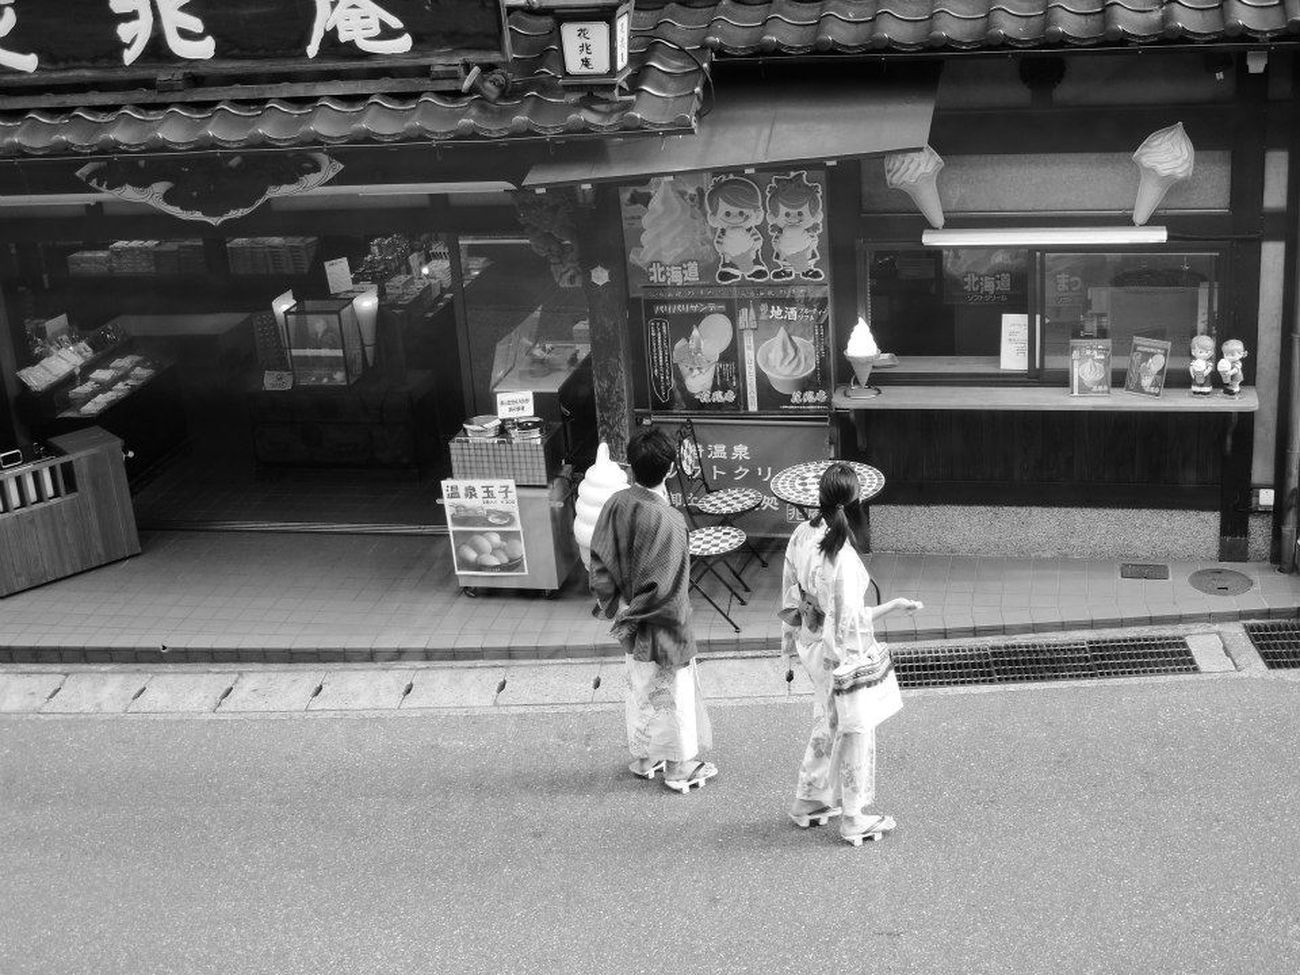 Japan Japan Photography Japanese Culture Japanese Garden Japanese Onsen Japanese Style Japanese Temple Kinosaki Lifestyles Two People Walking YUKATA